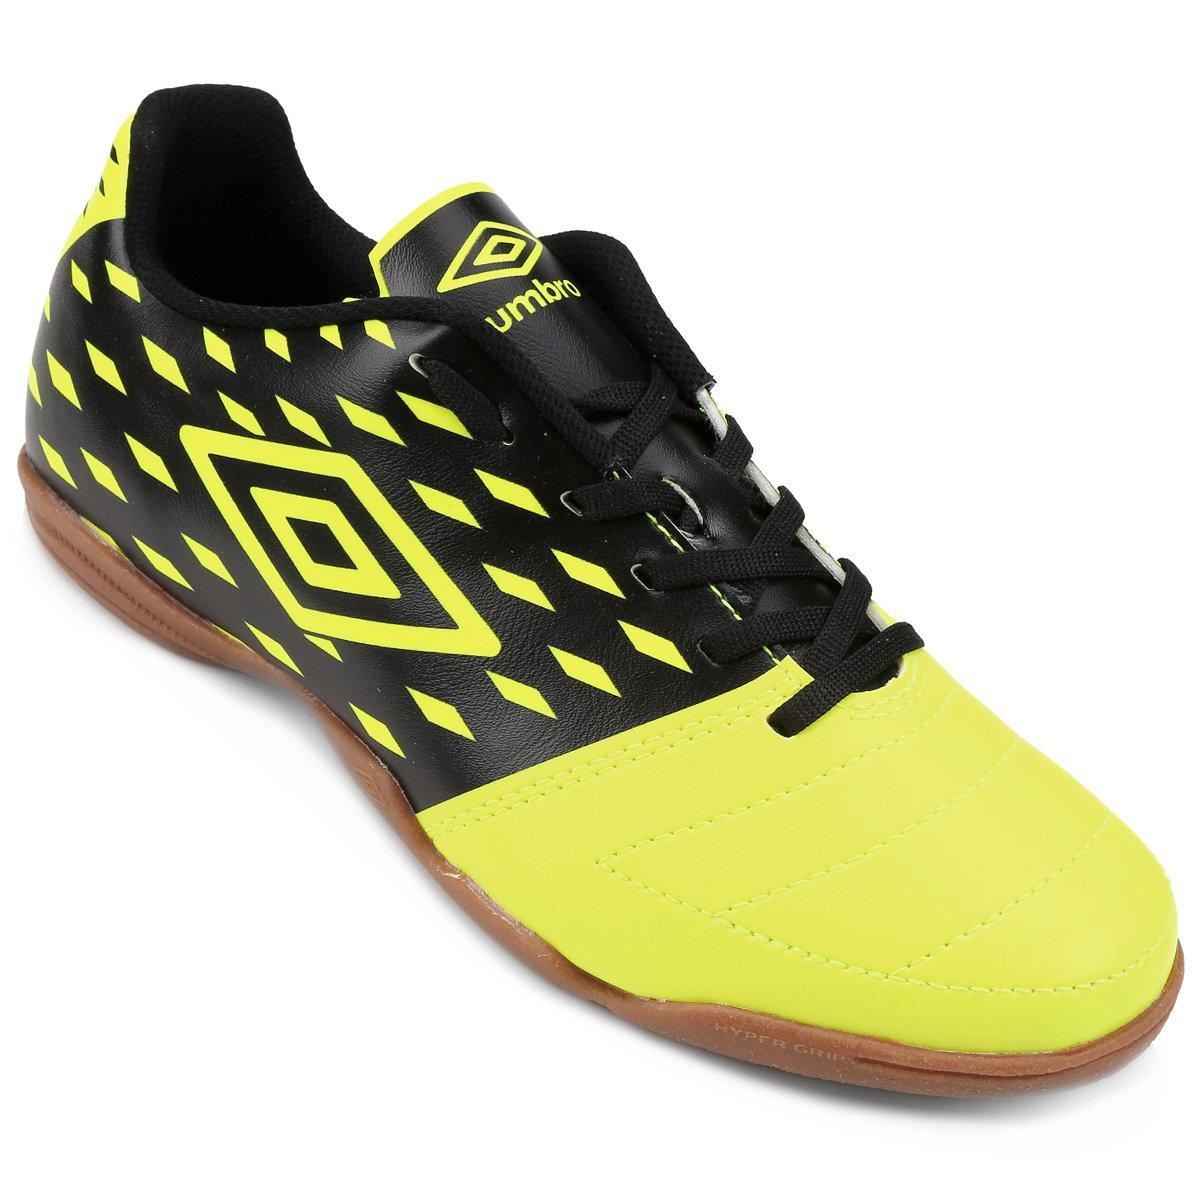 b7fb5c6fb07ec Chuteira Futsal Umbro Stratus - Compre Agora